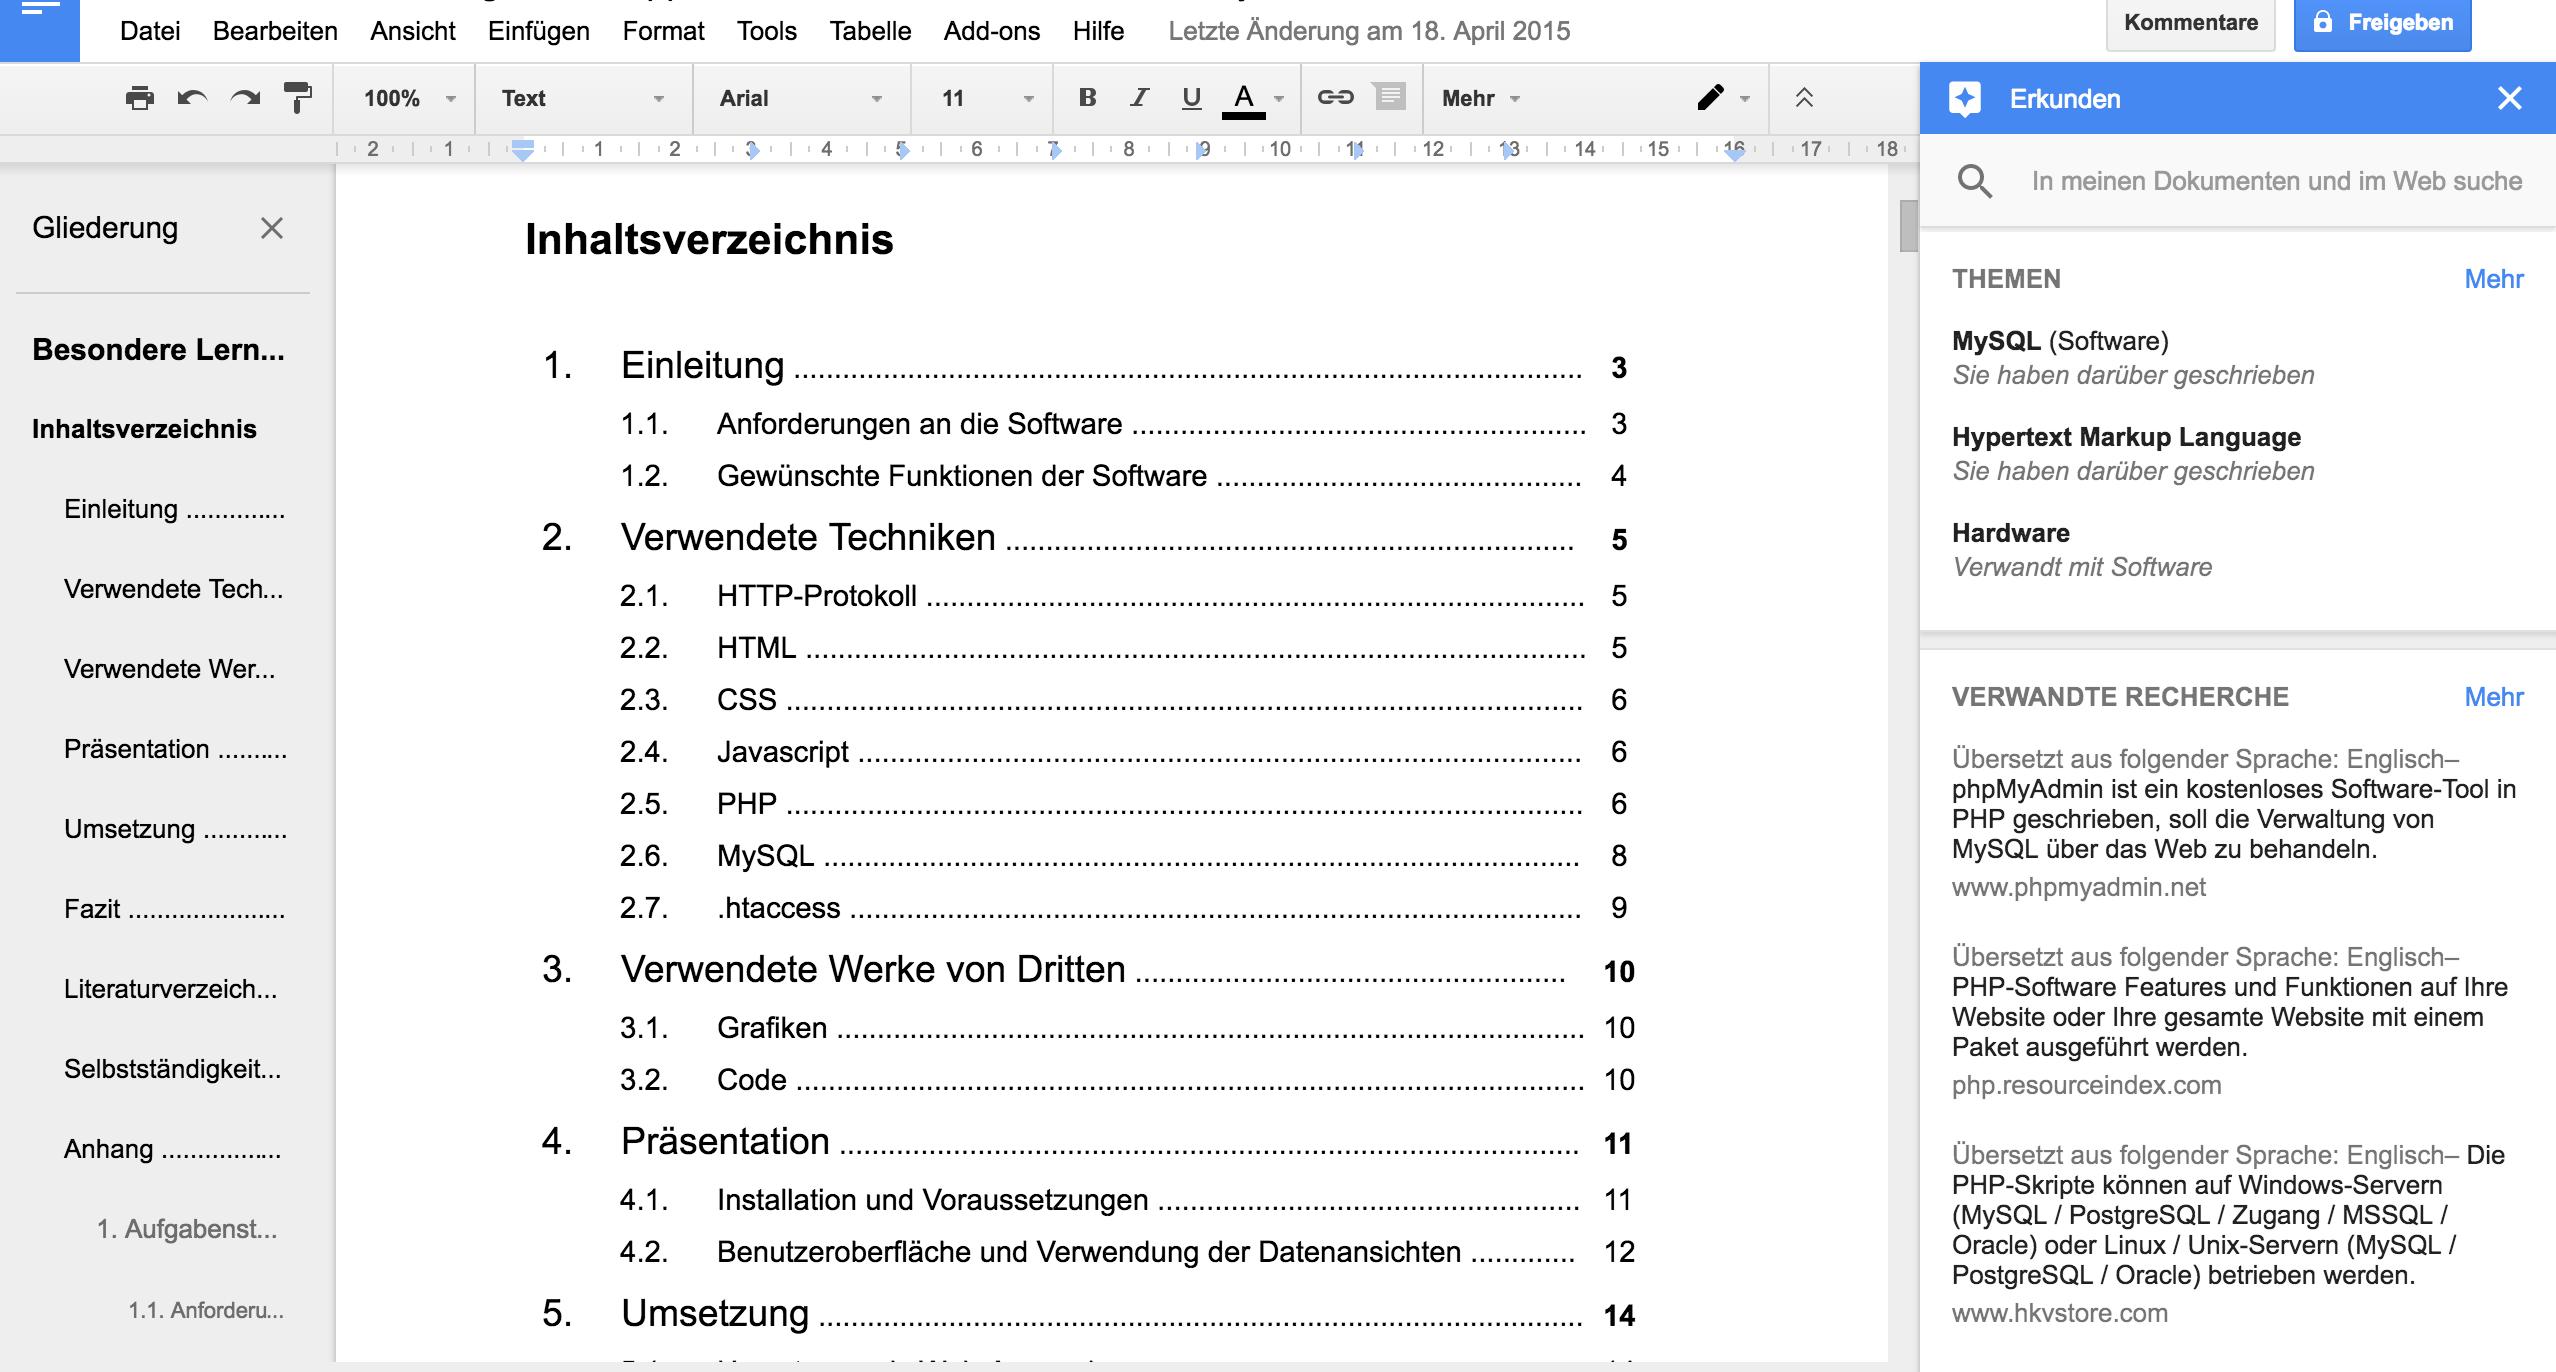 Der ultimative Leitfaden für Google Docs – Phips Blog